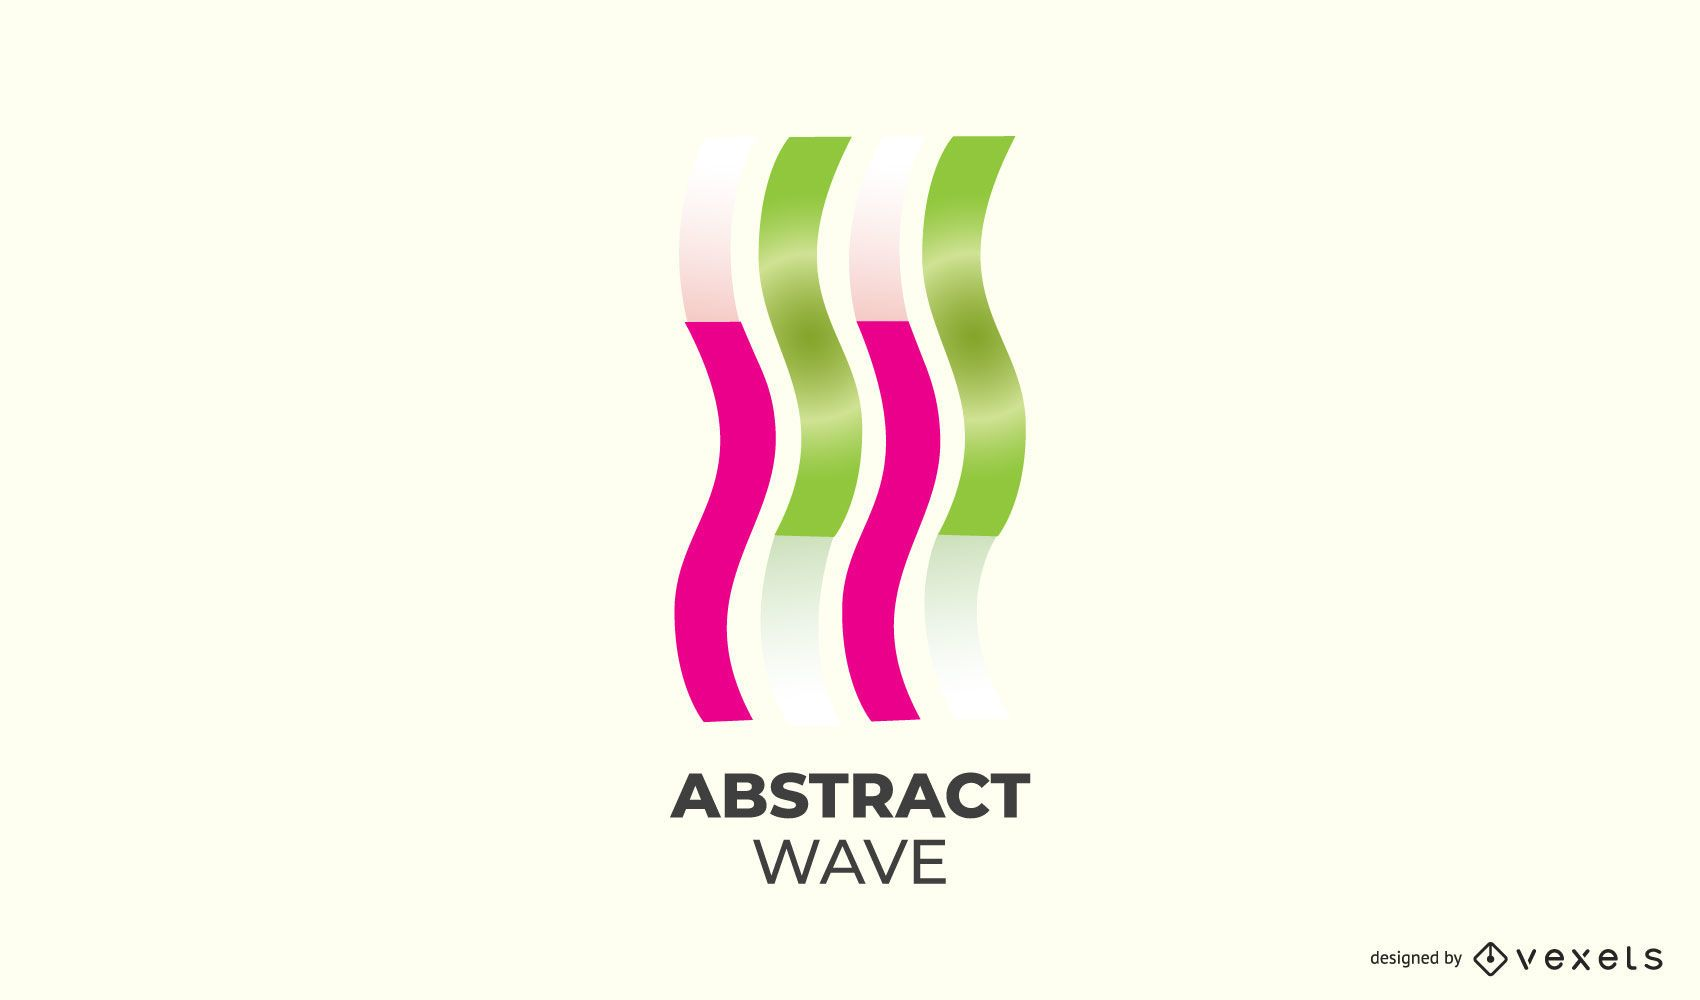 Abstract Upwards Wave Logo Design